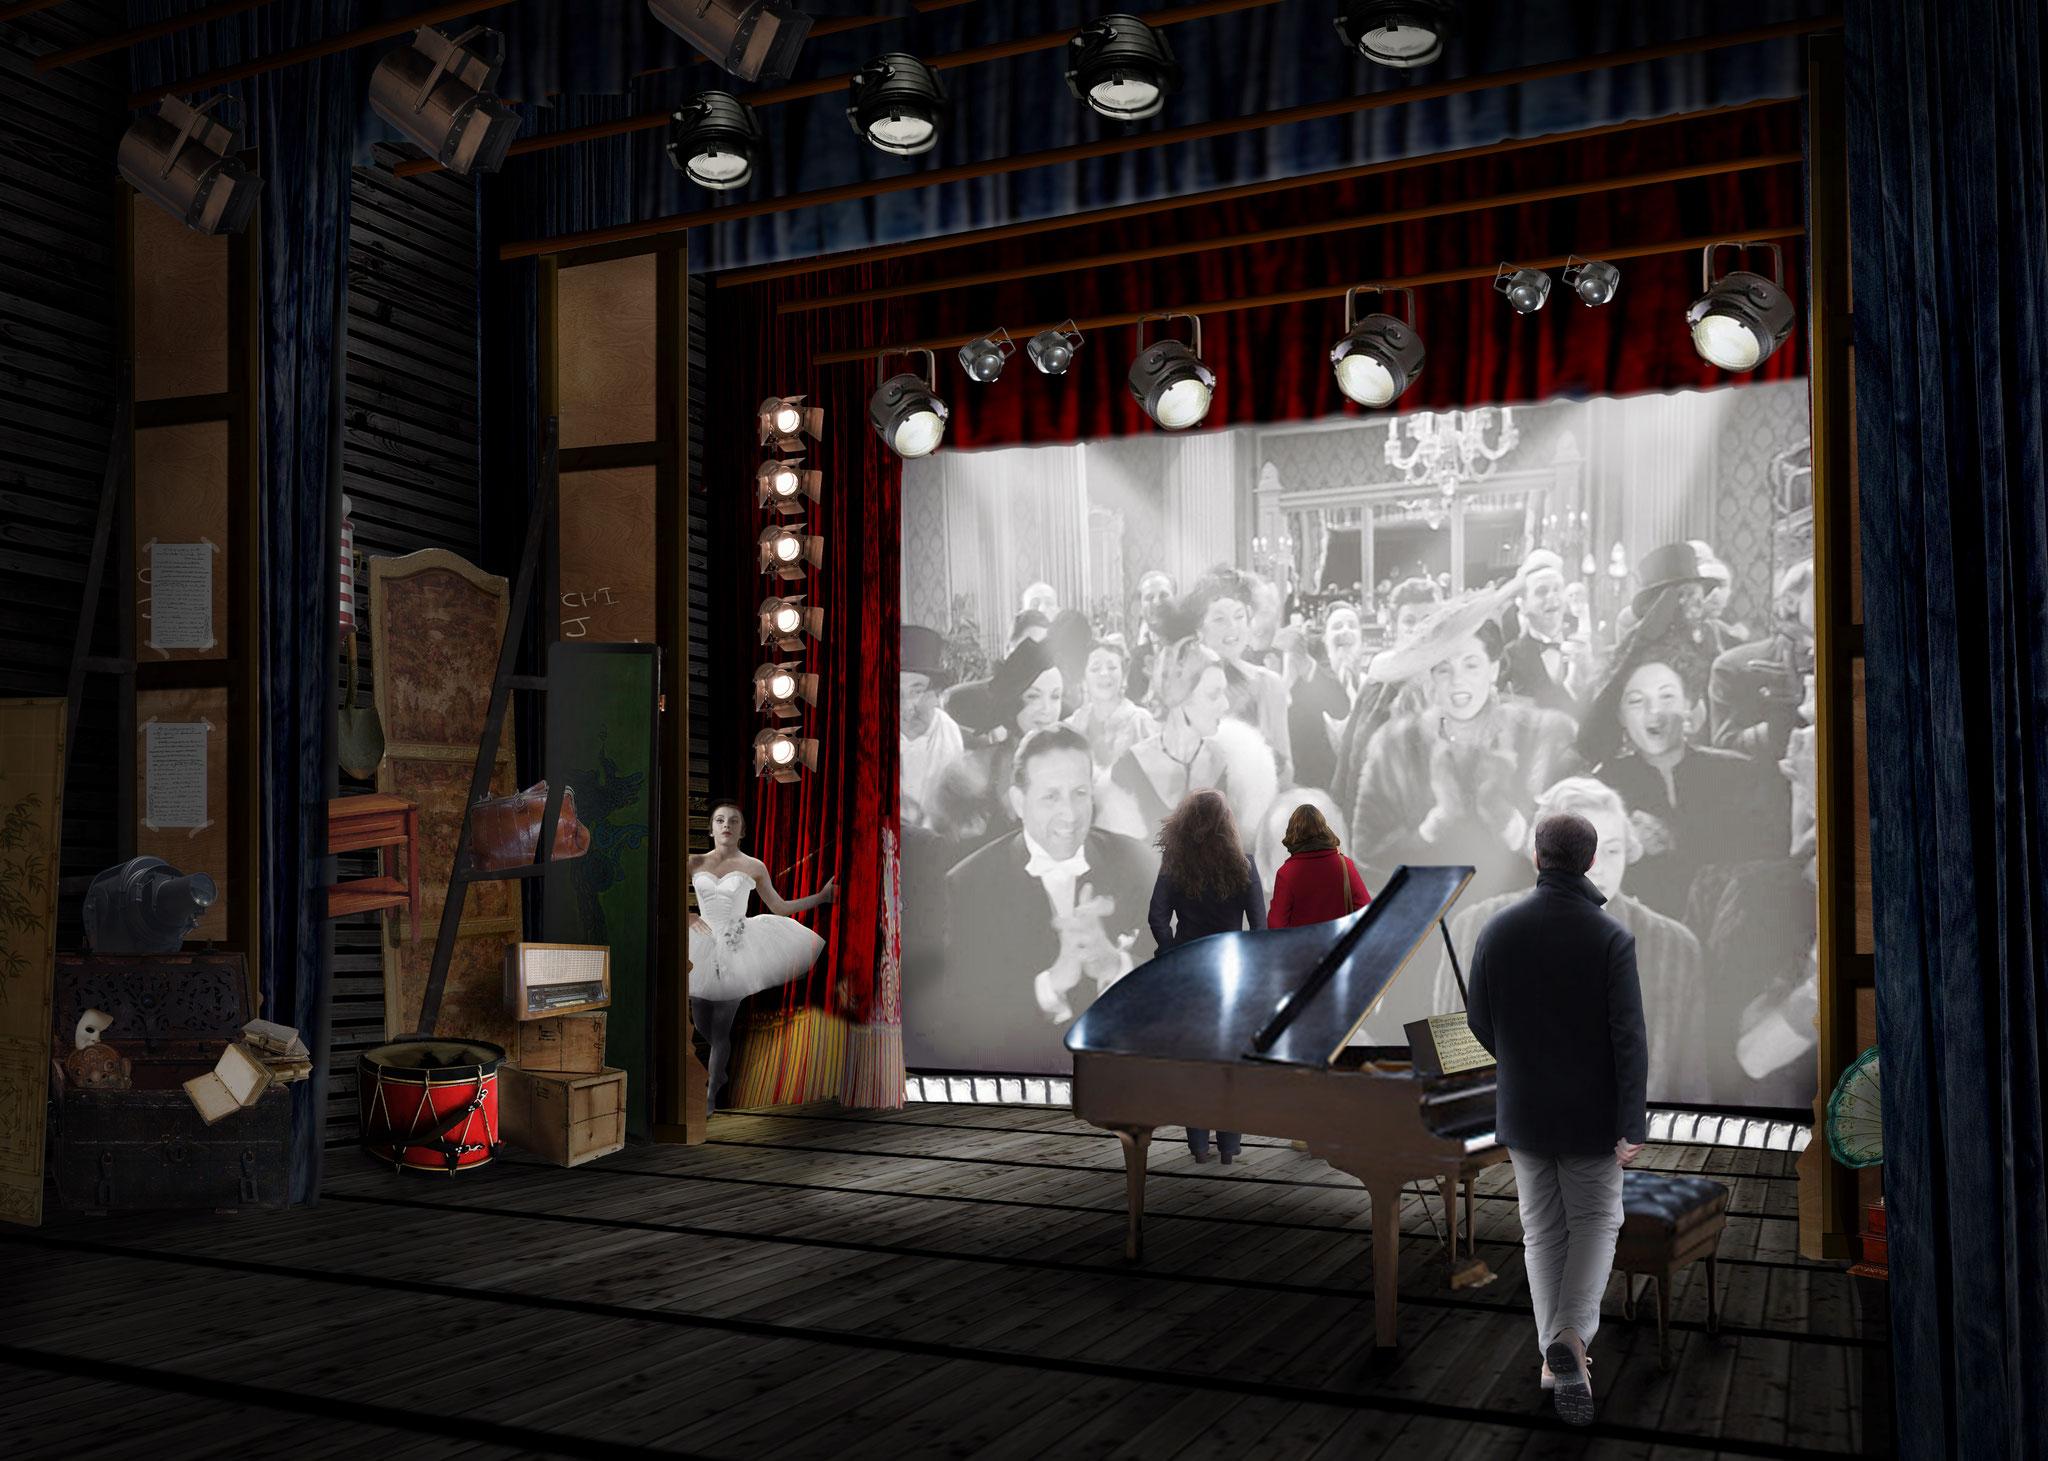 Chaplin's World - Espace théâtre - Agence Confino - 2014